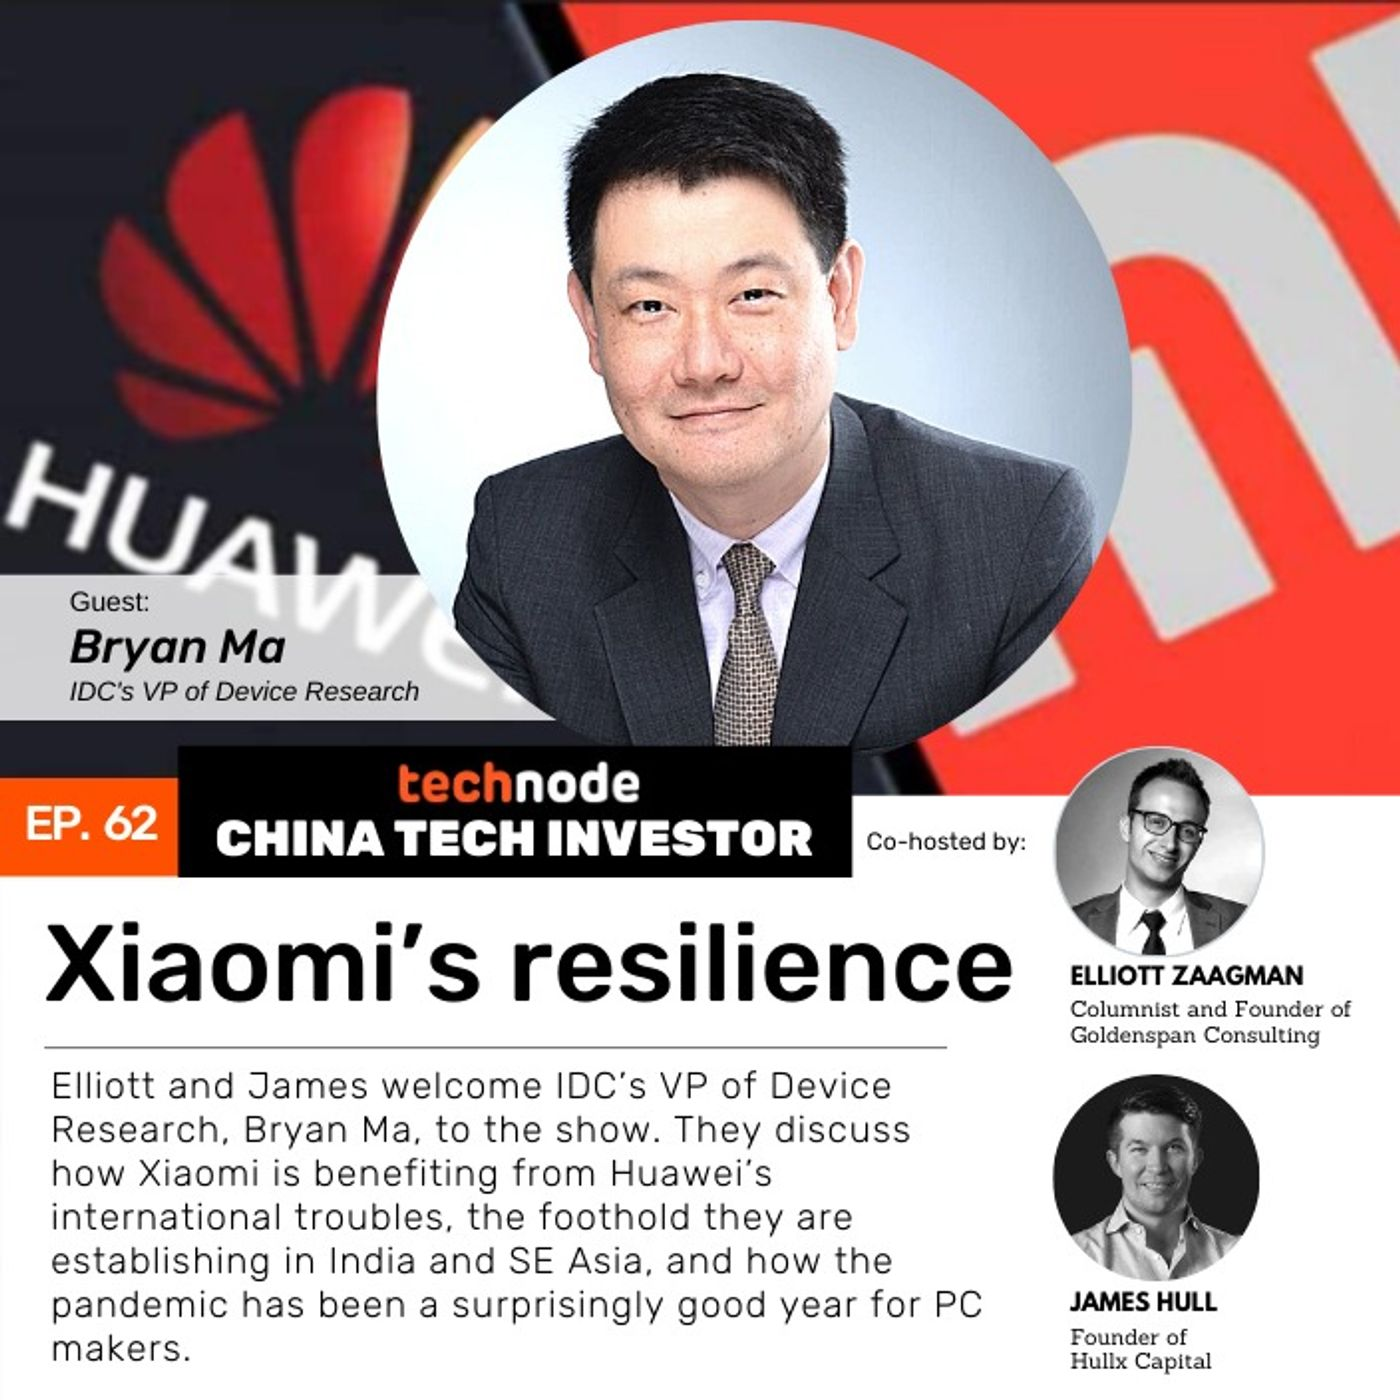 CTI 62: Xiaomi's resilience, with Bryan Ma